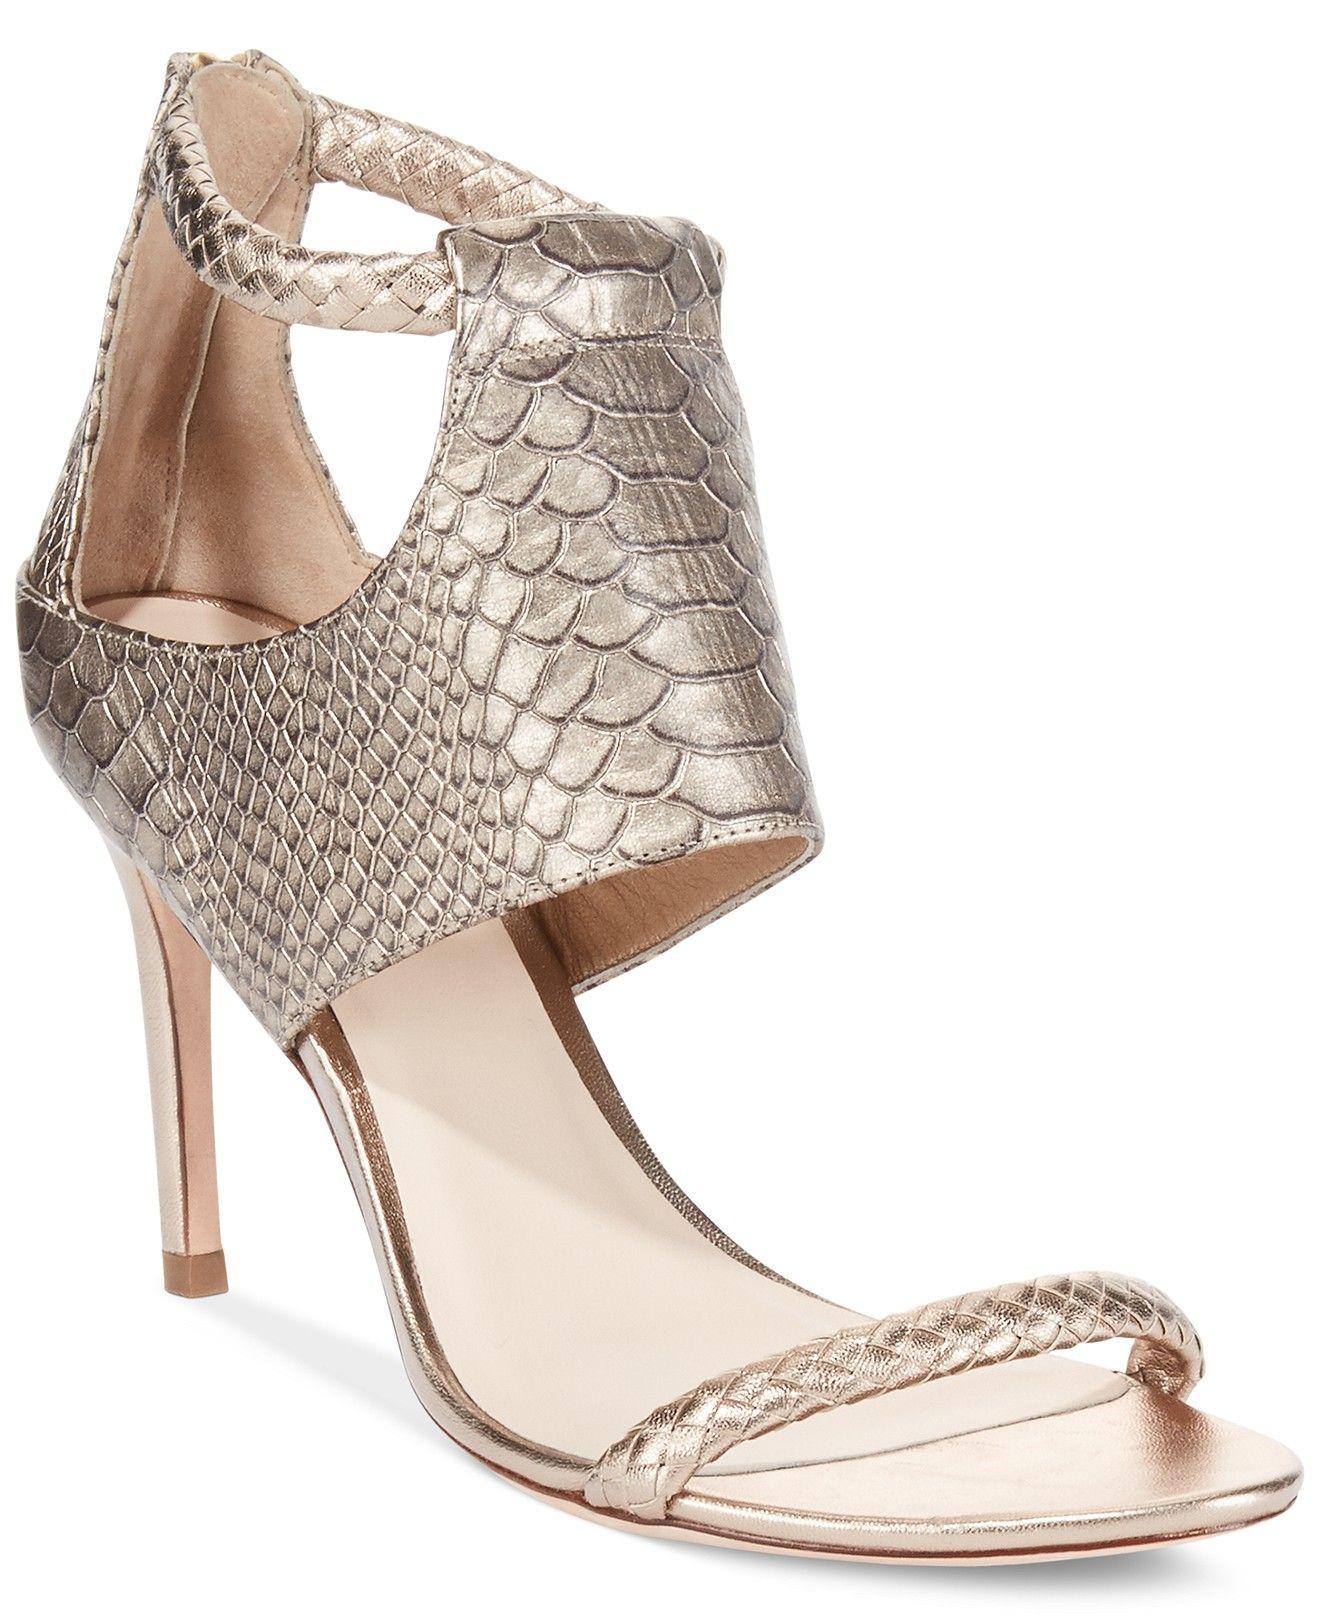 Cole Haan Womenu0027s Lise Evening Sandals   Evening U0026 Bridal   Shoes   Macyu0027s